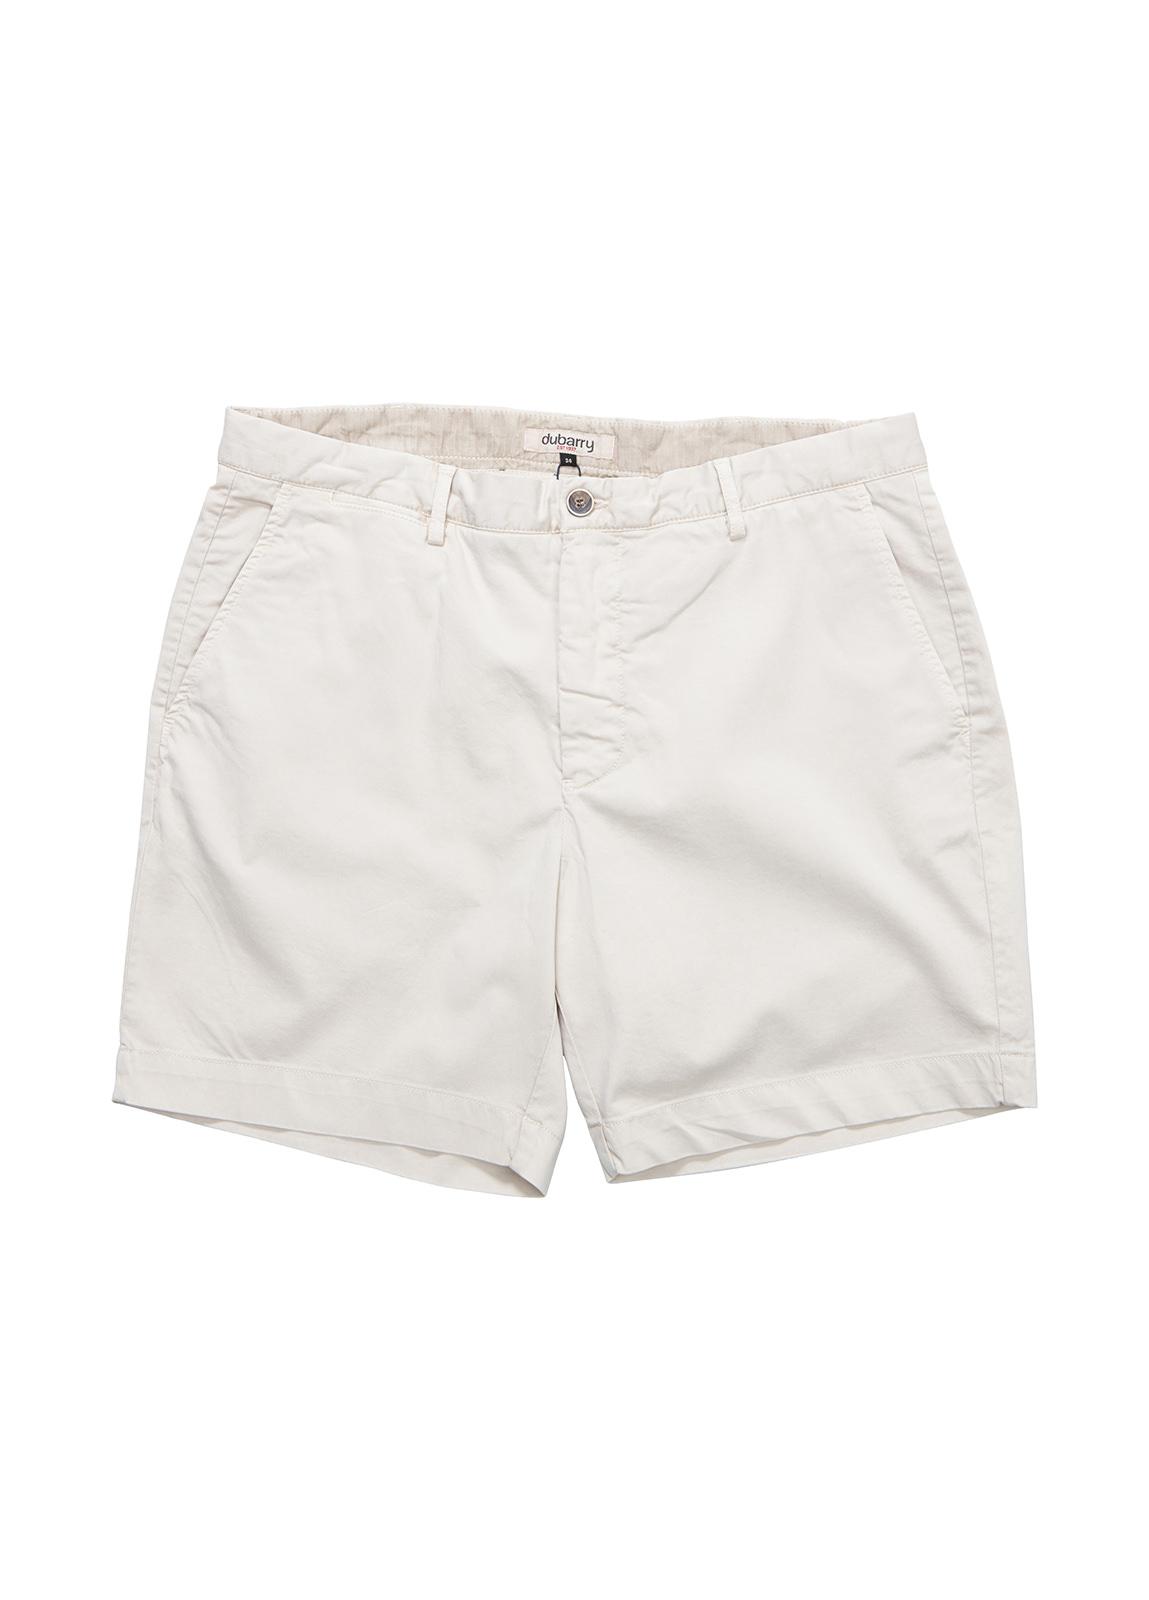 Glandore Men's Shorts - Stone